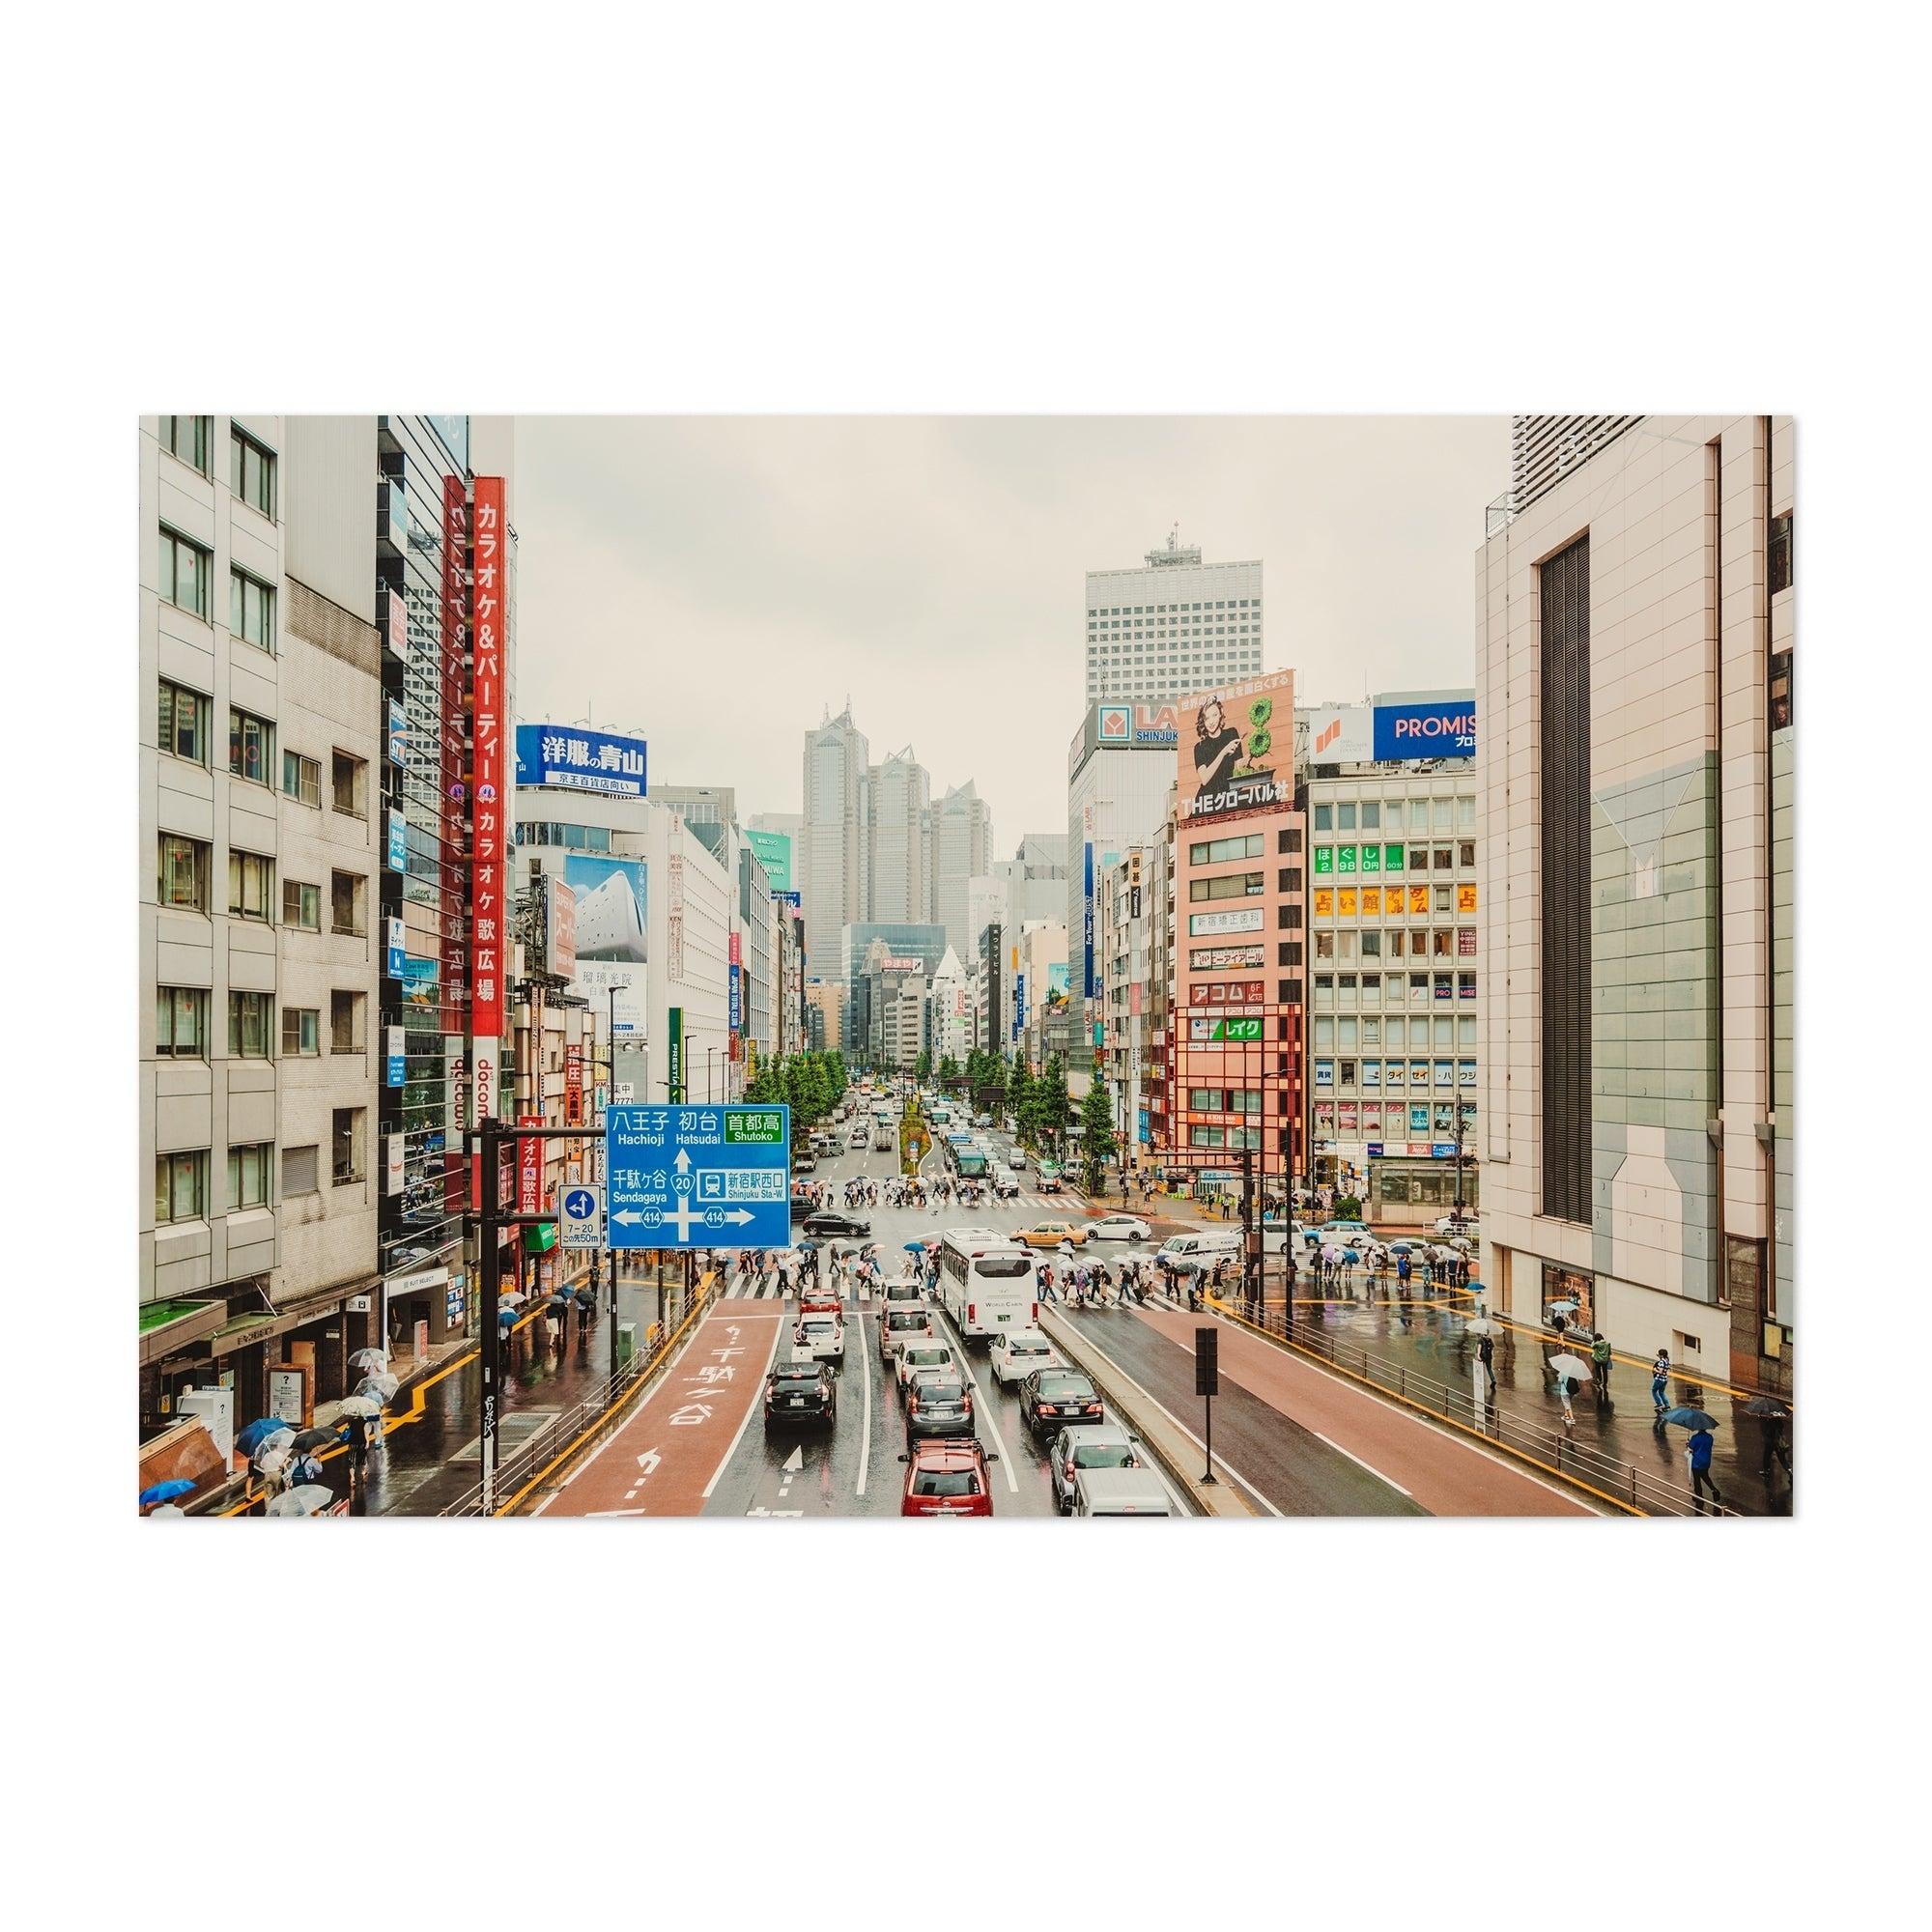 Noir Gallery Shinjuku Tokyo Japan Cityscape Unframed Art